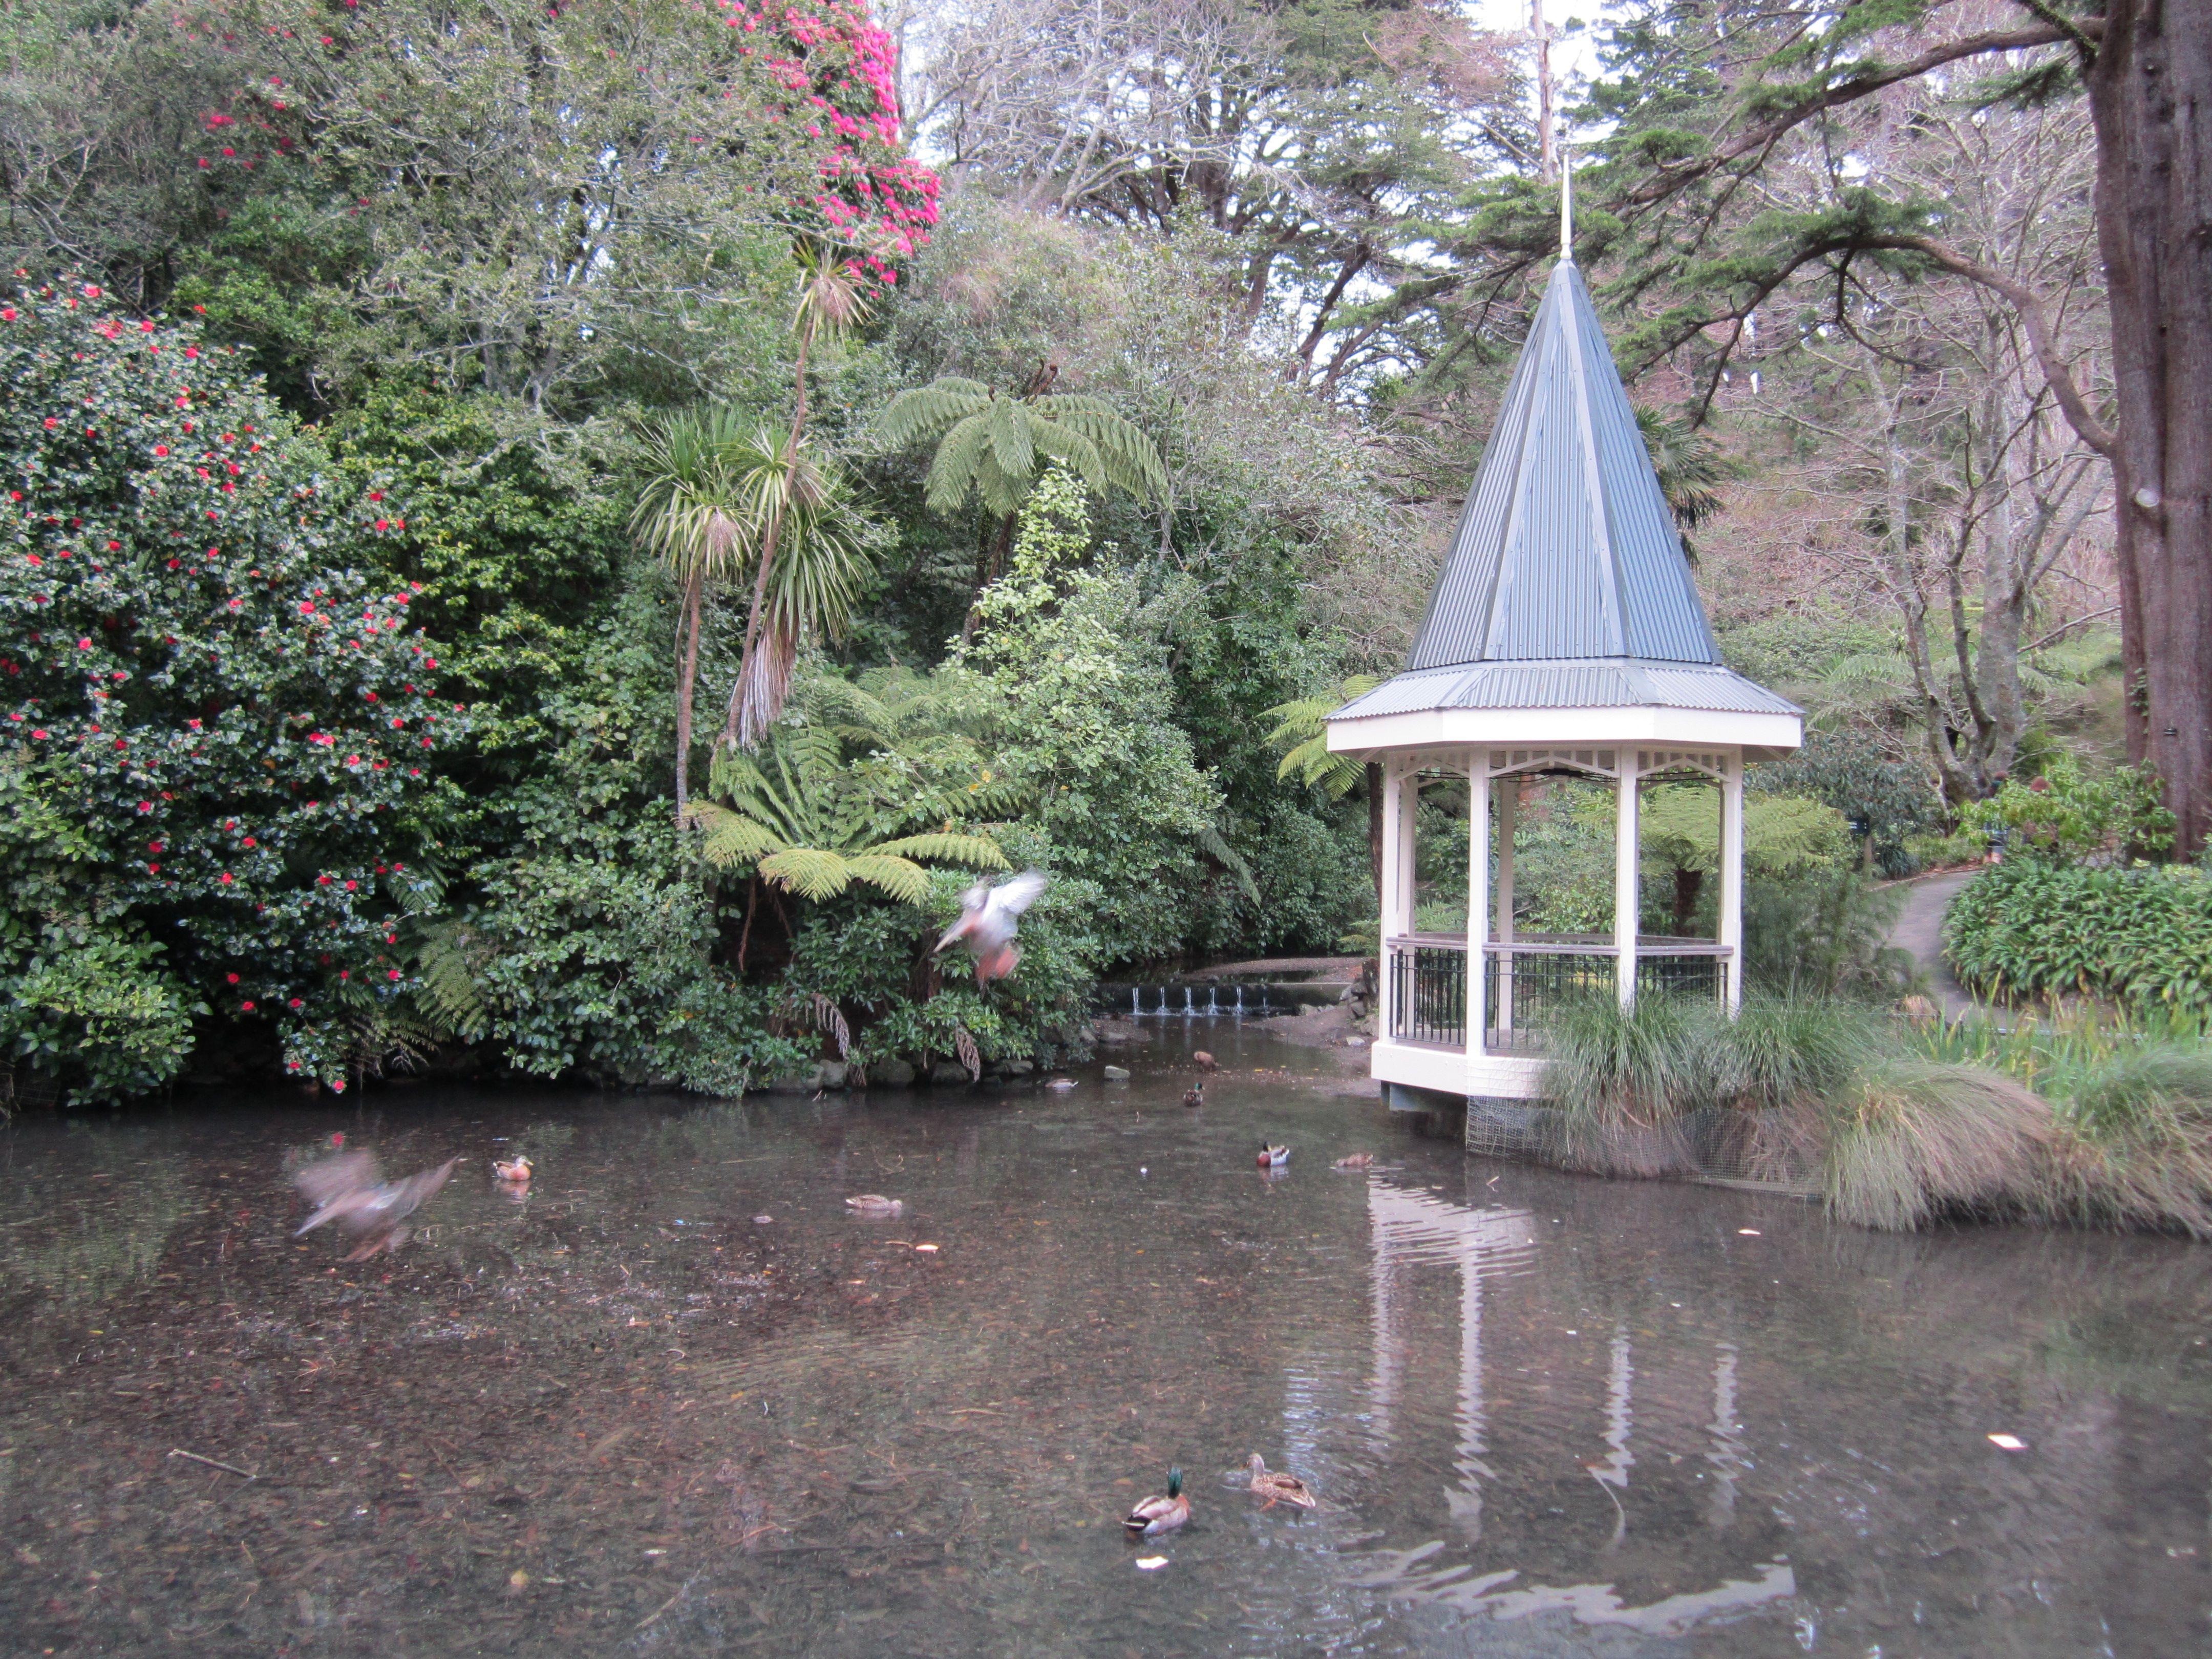 botanical gardens in winter wellington nz wellington new zealand